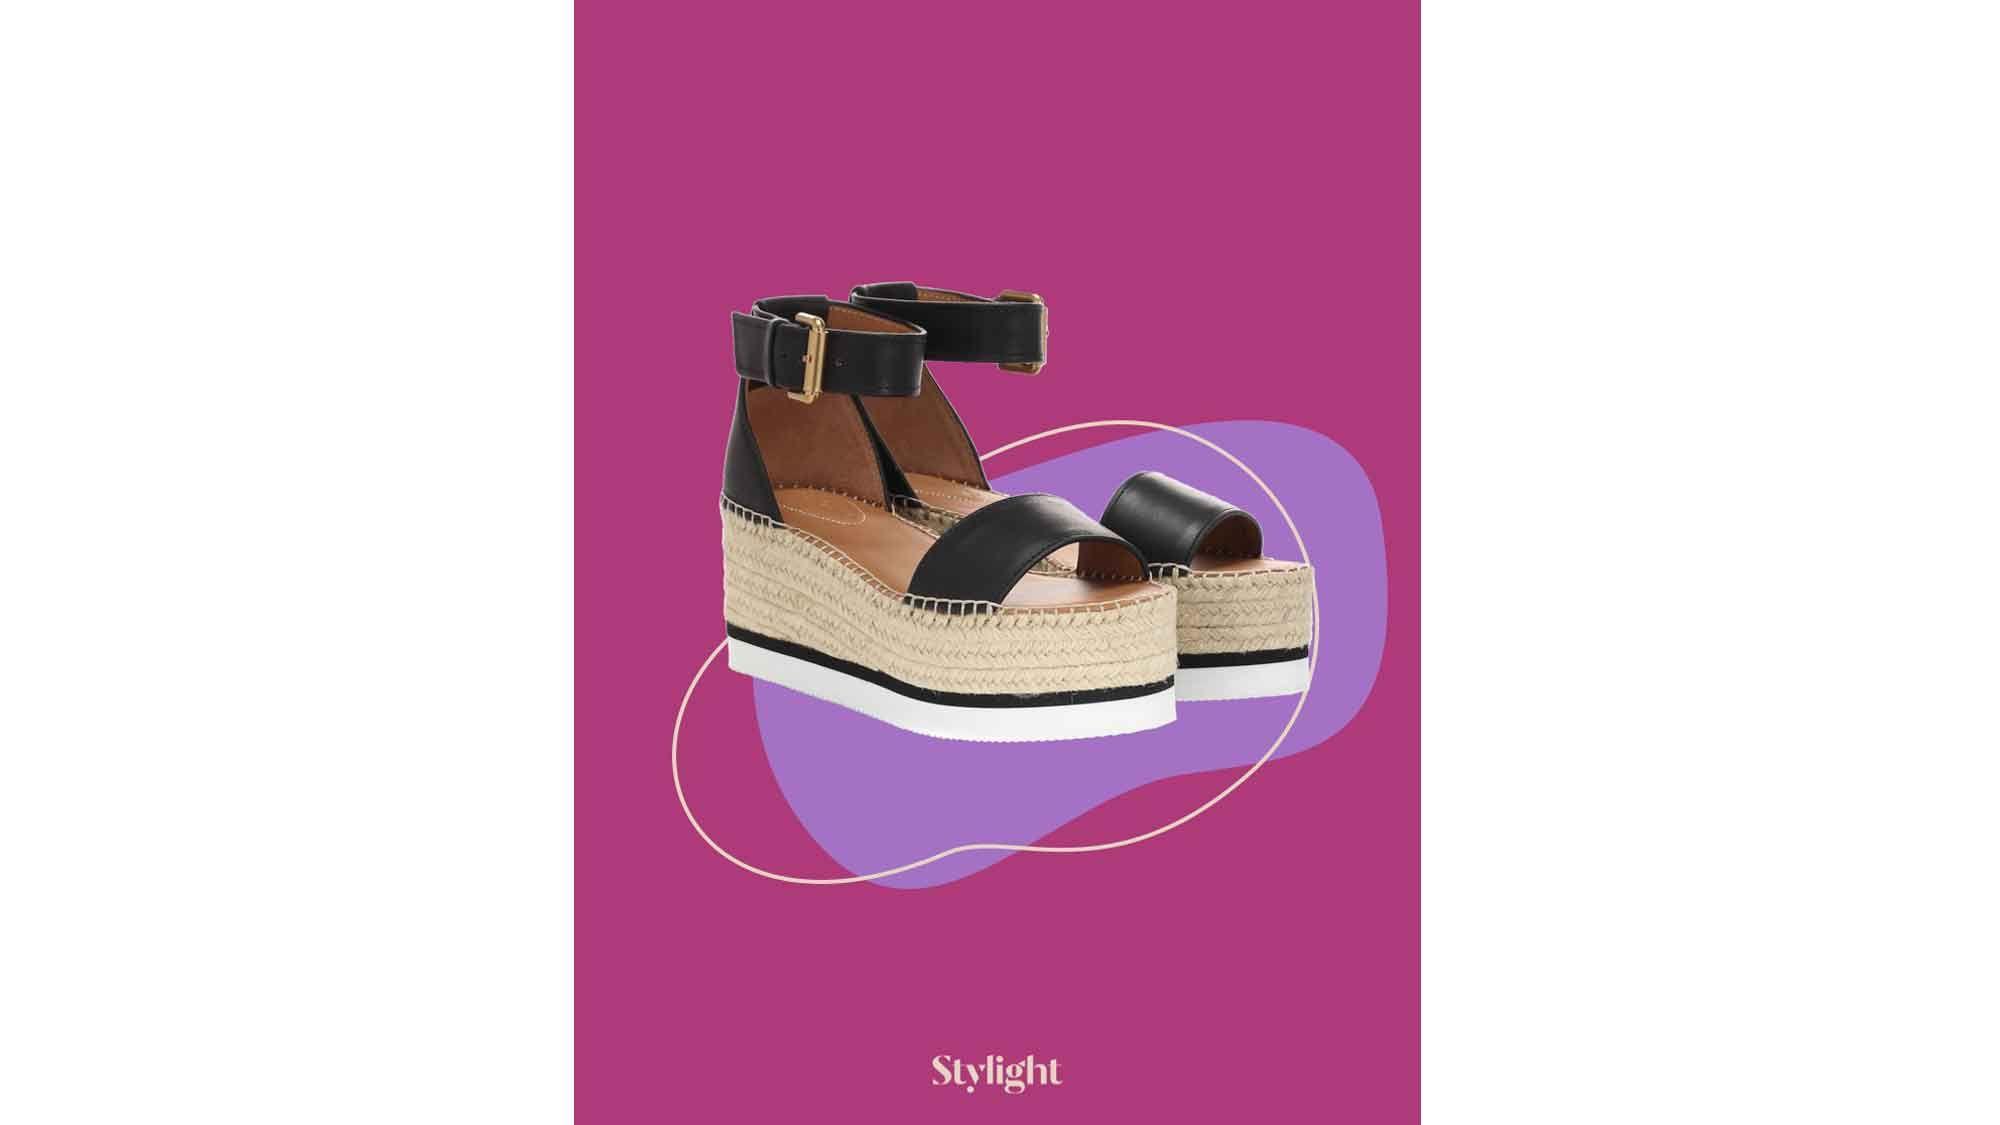 stylight-sandalenplateau.jpg